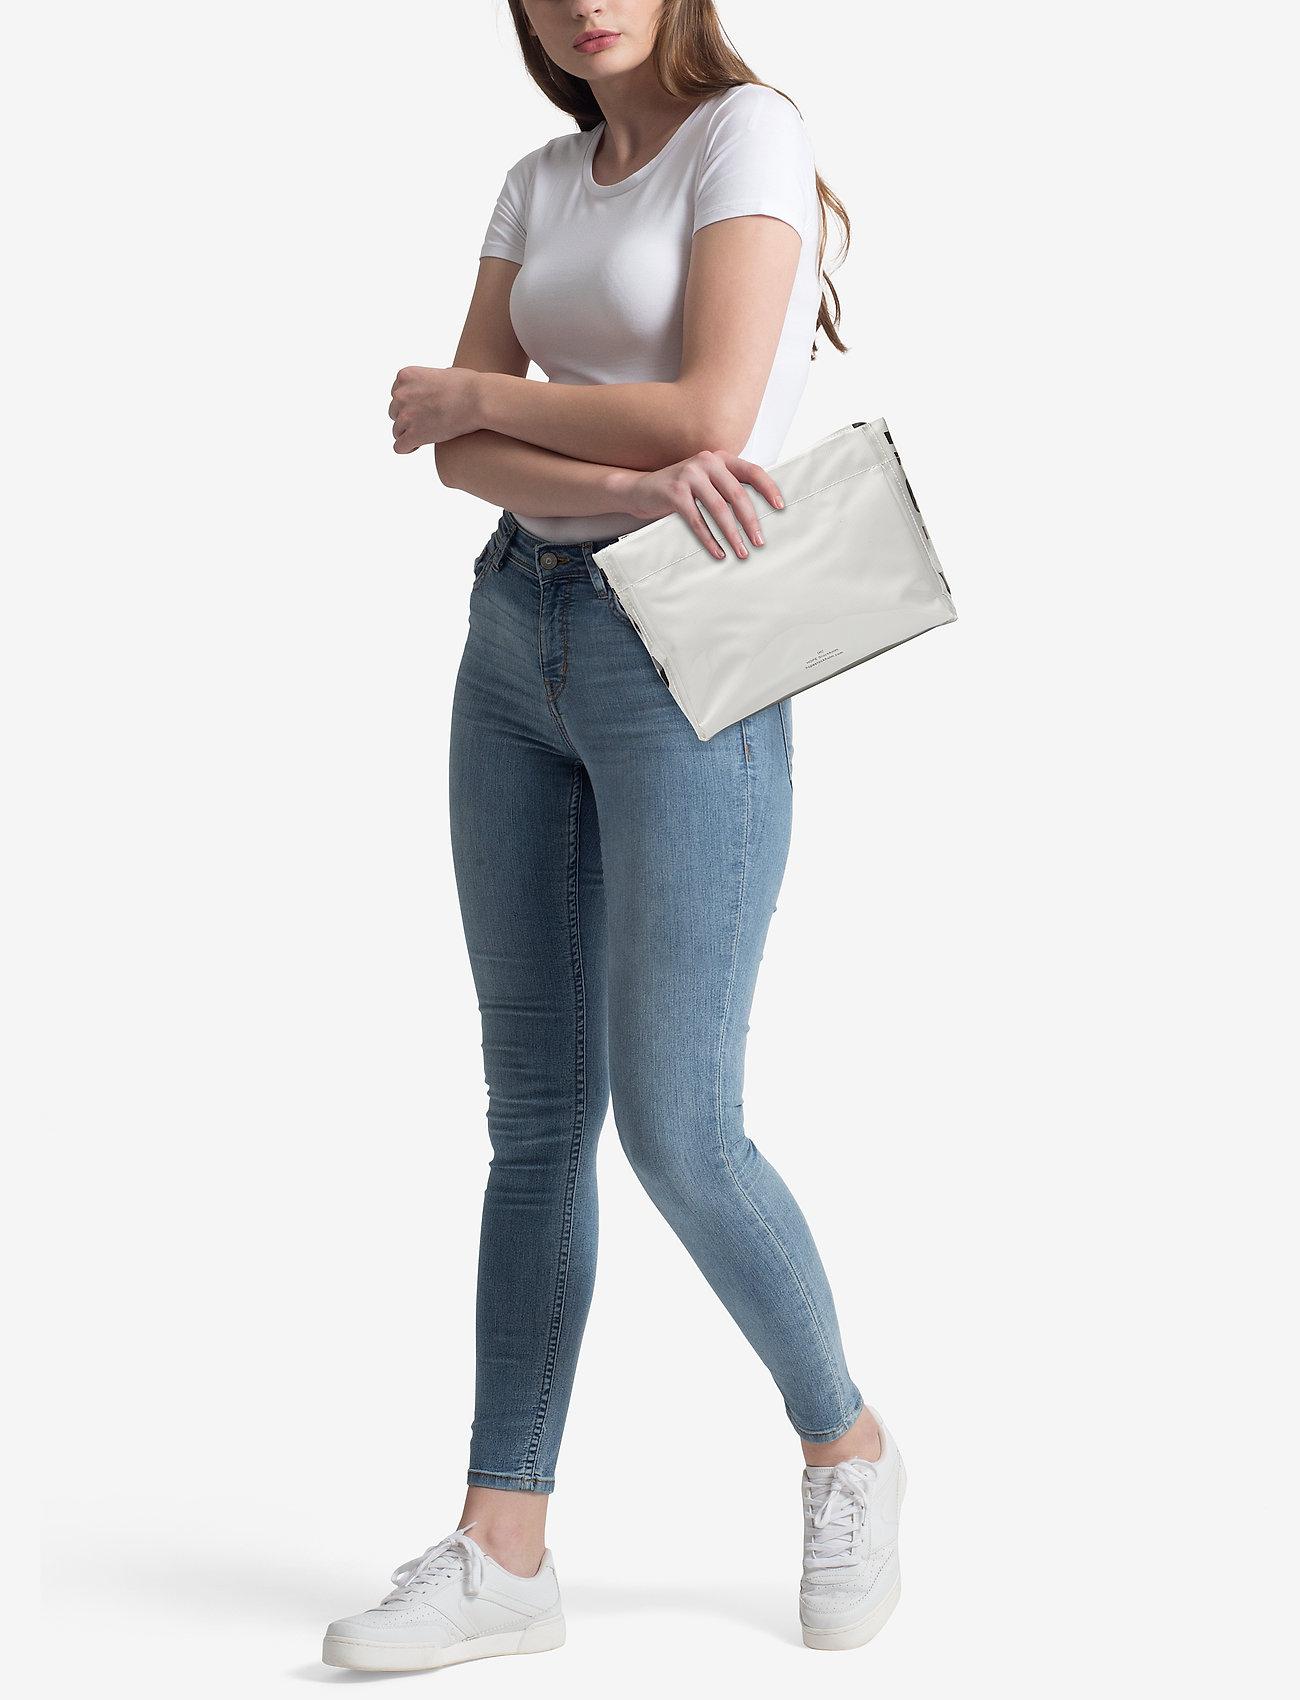 Hope Ithem Bag - WHITE